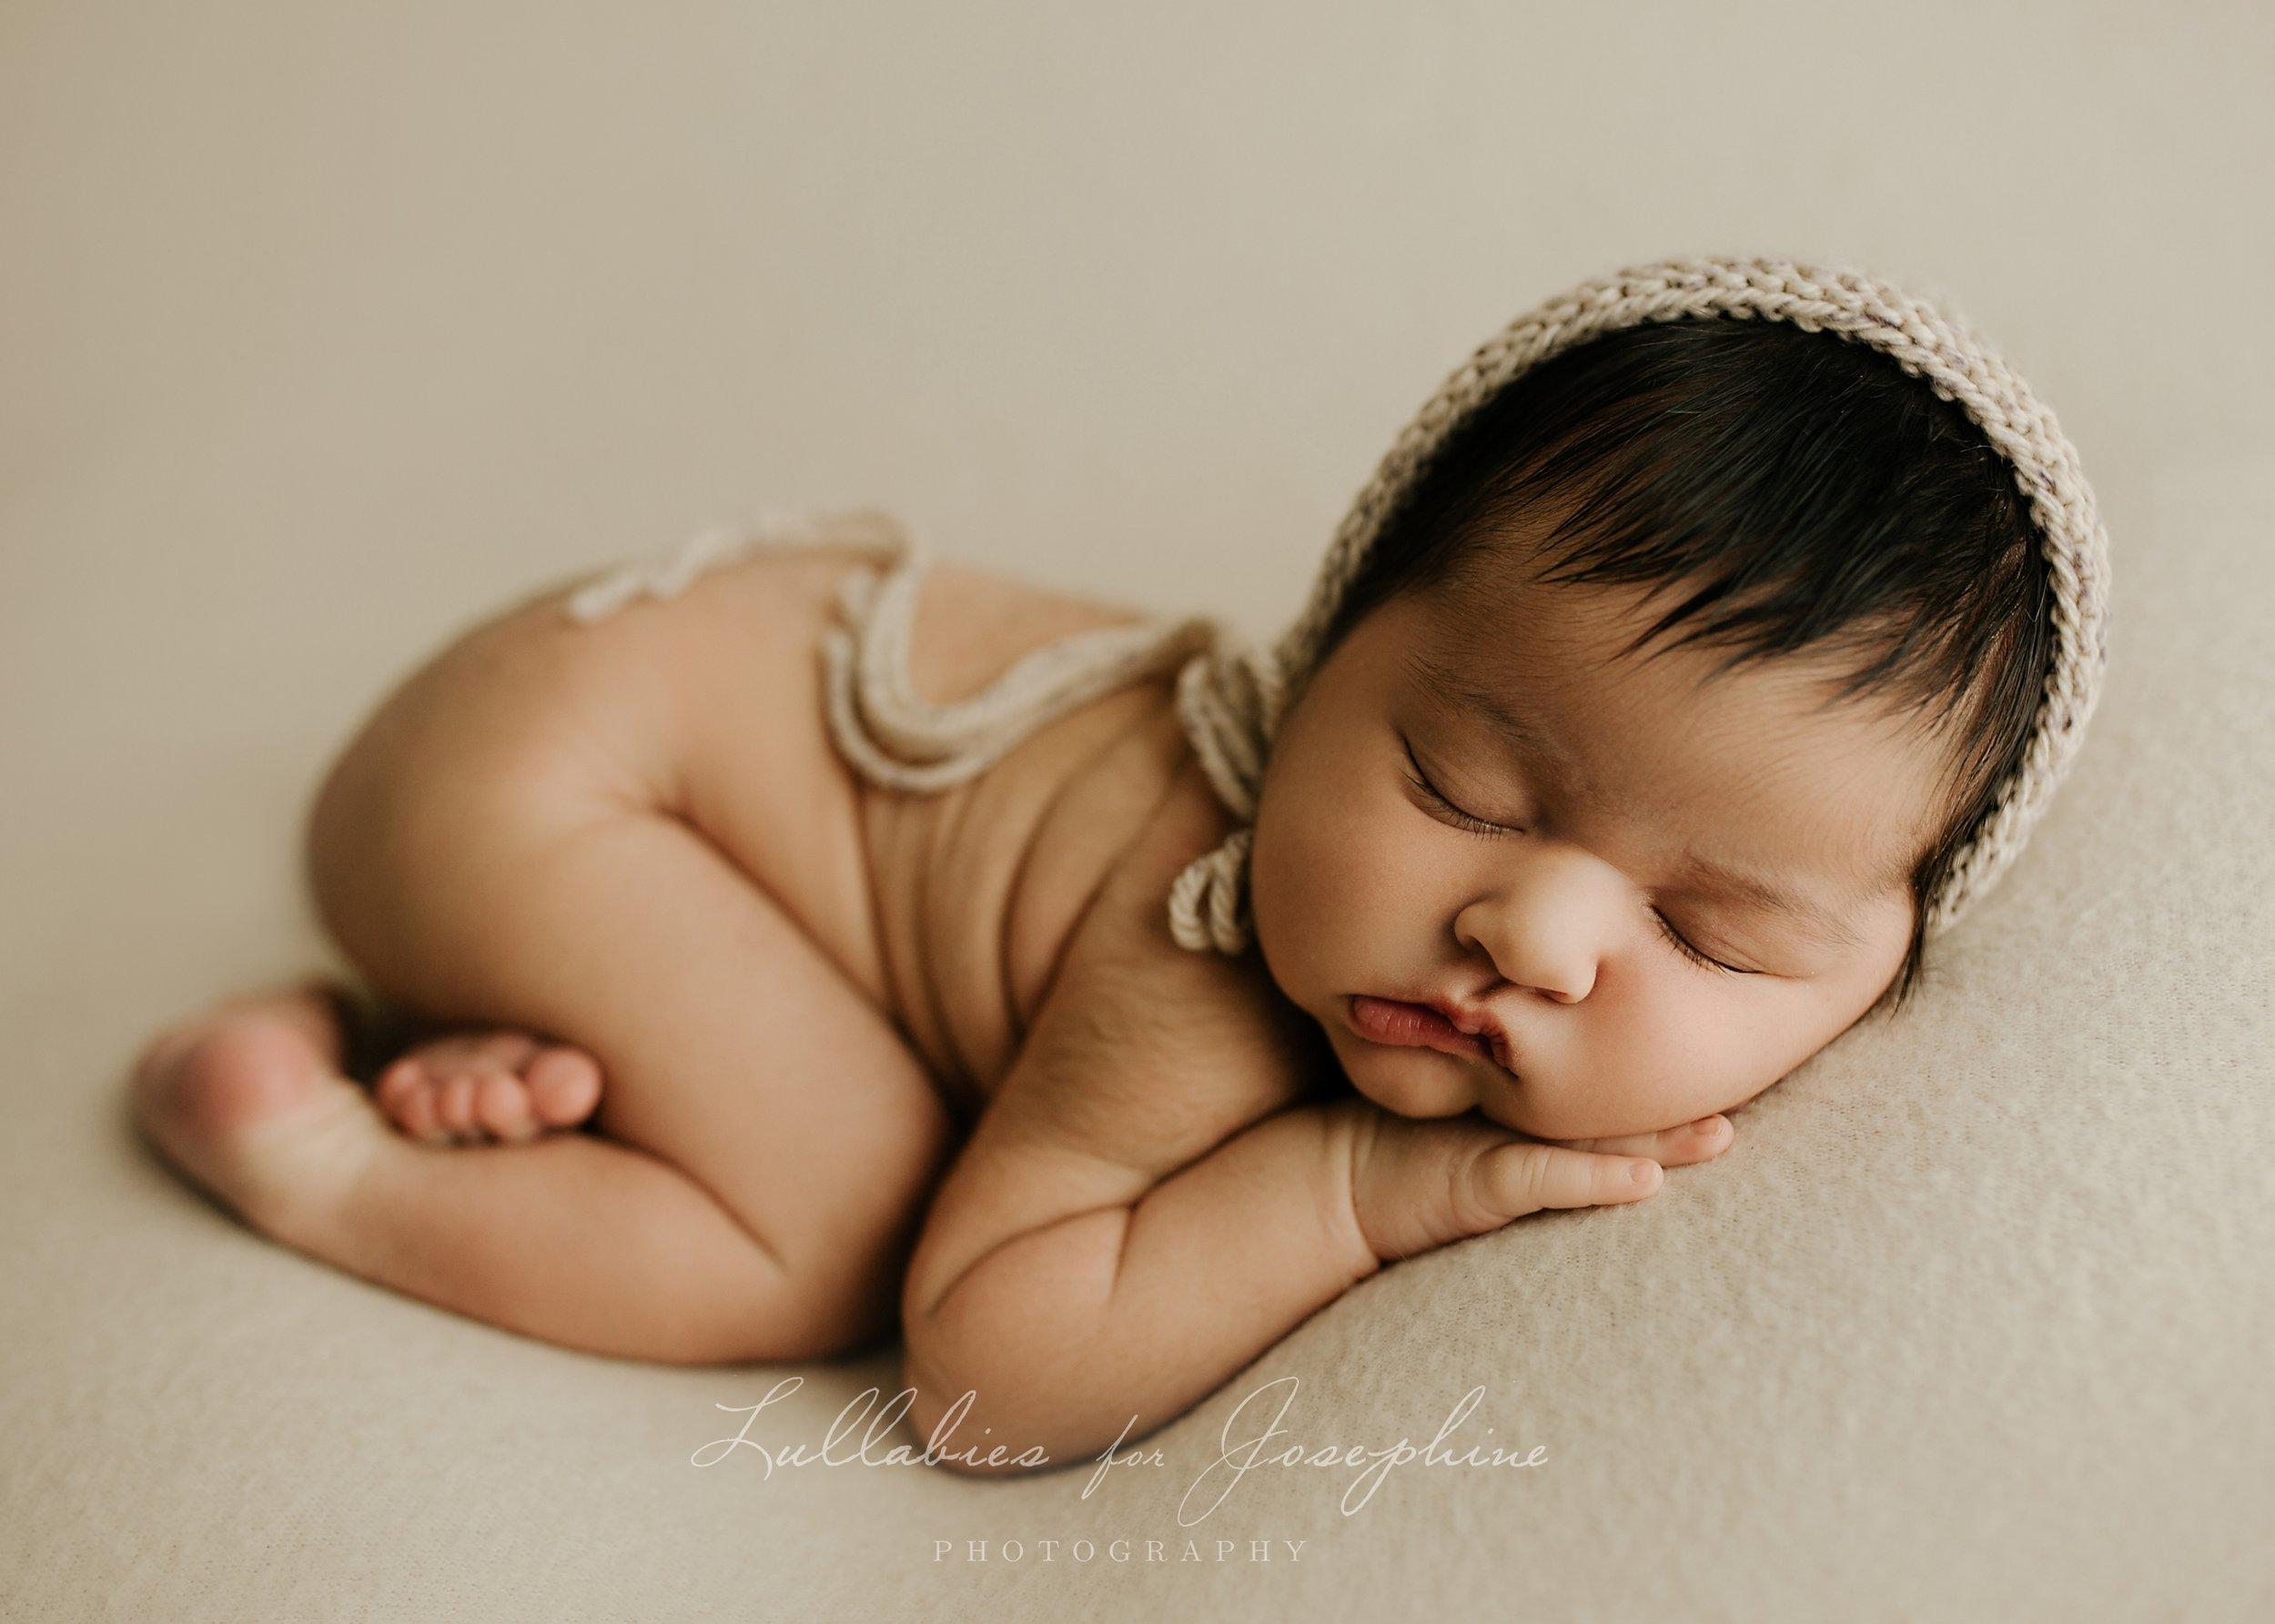 NJ-newborn-baby-photographer-bonnet-naked-pose-sleepy-baby